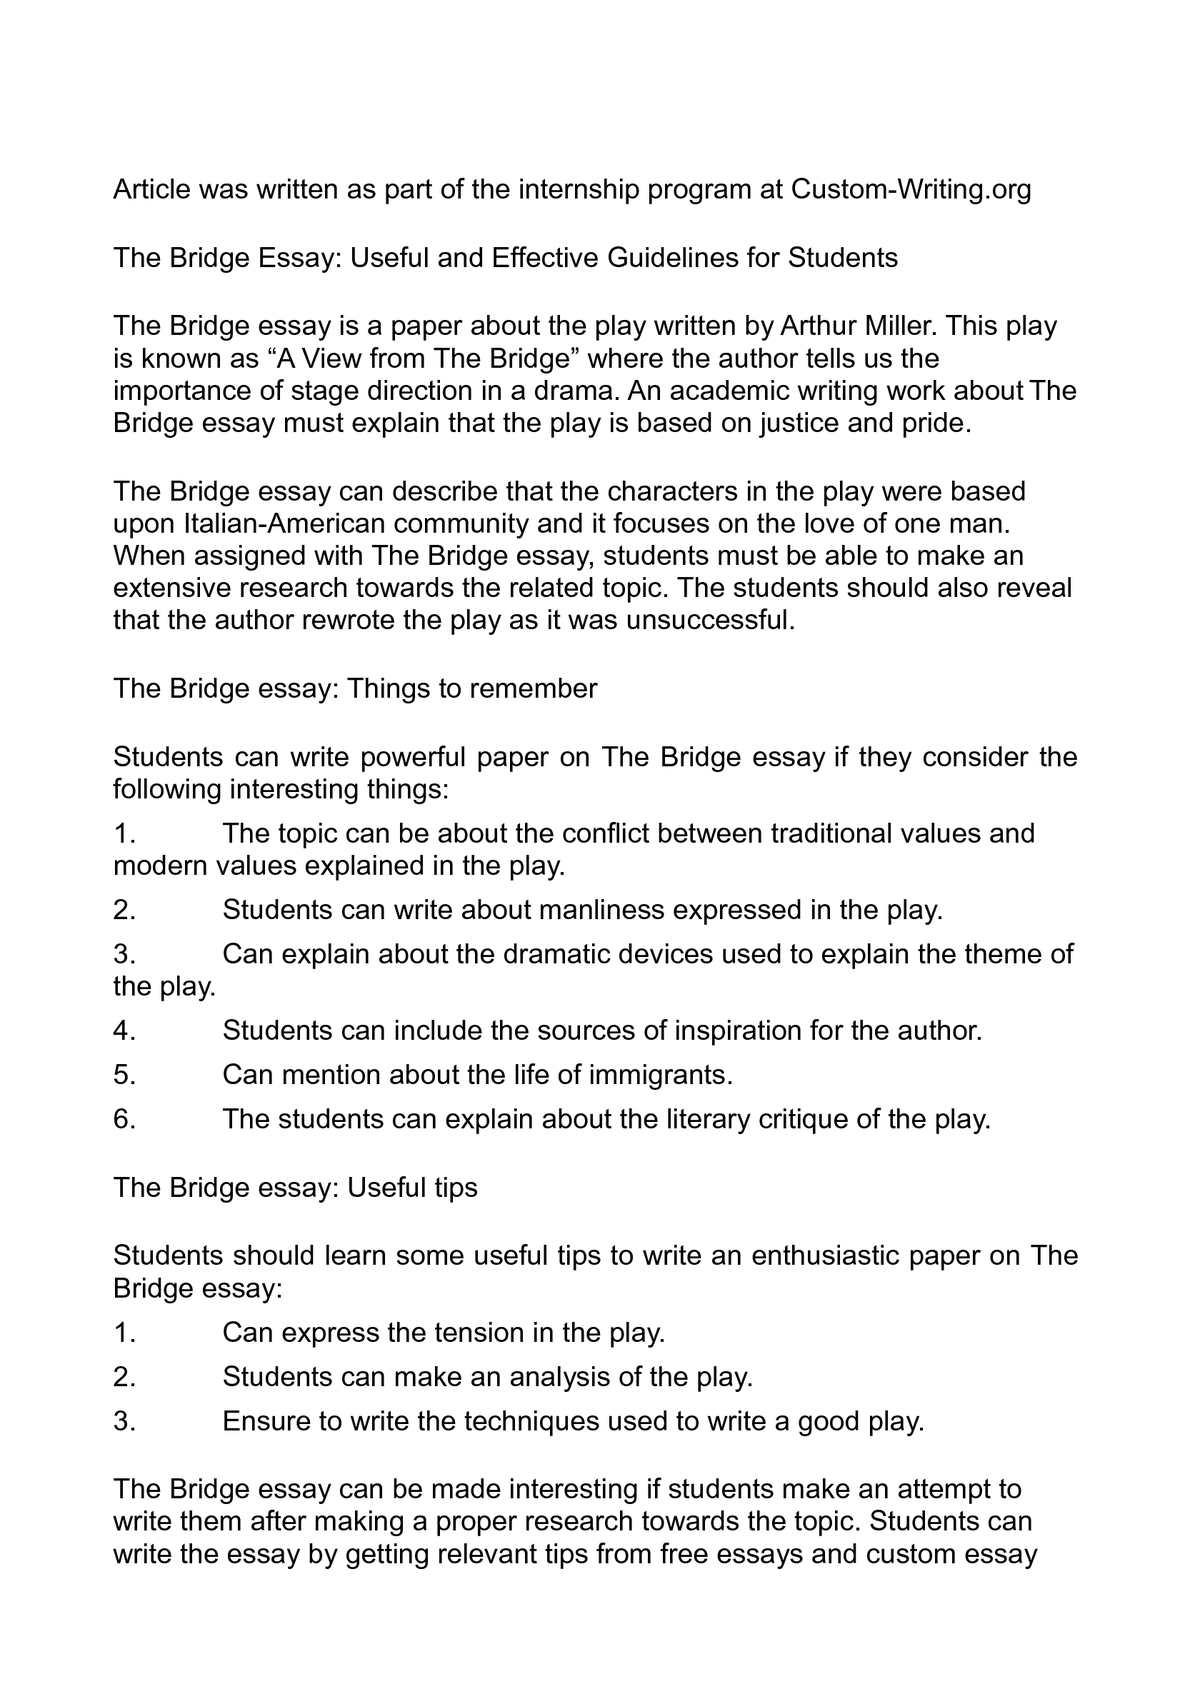 002 Essay Example P1 Phenomenal Recycling In Hindi Persuasive Full